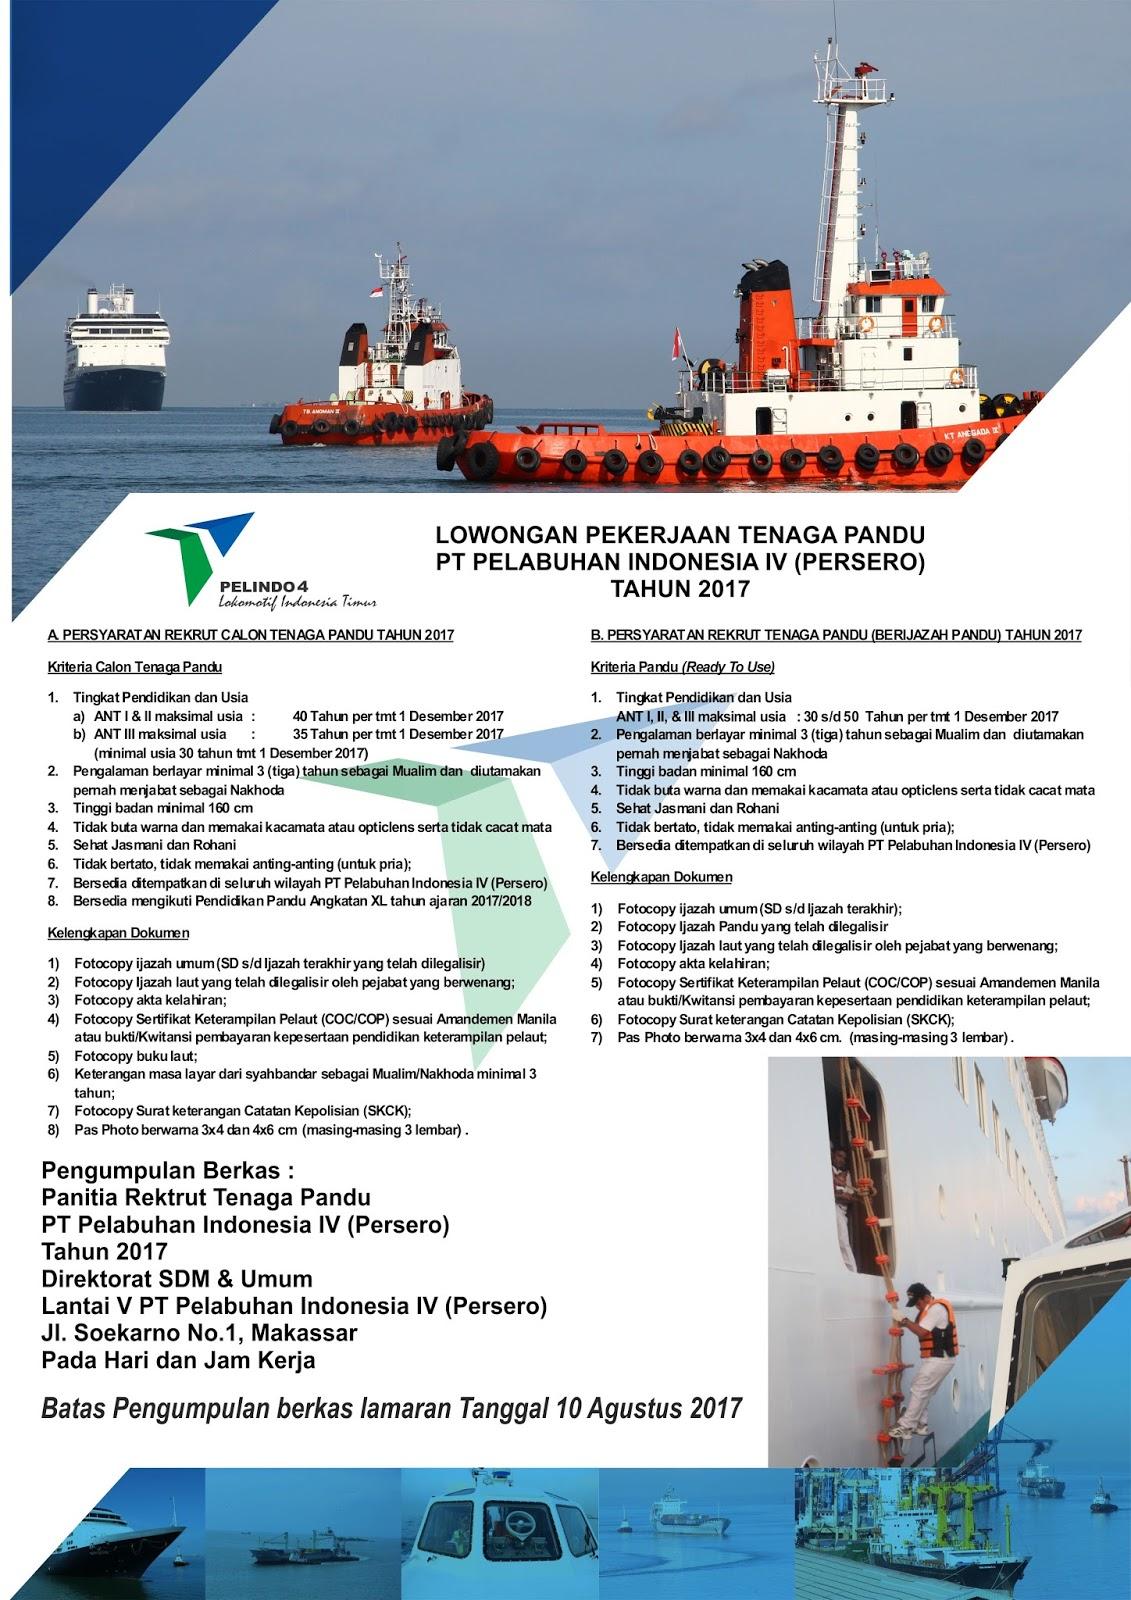 Lowongan Kerja PT Pelabuhan Indonesia IV (Persero)